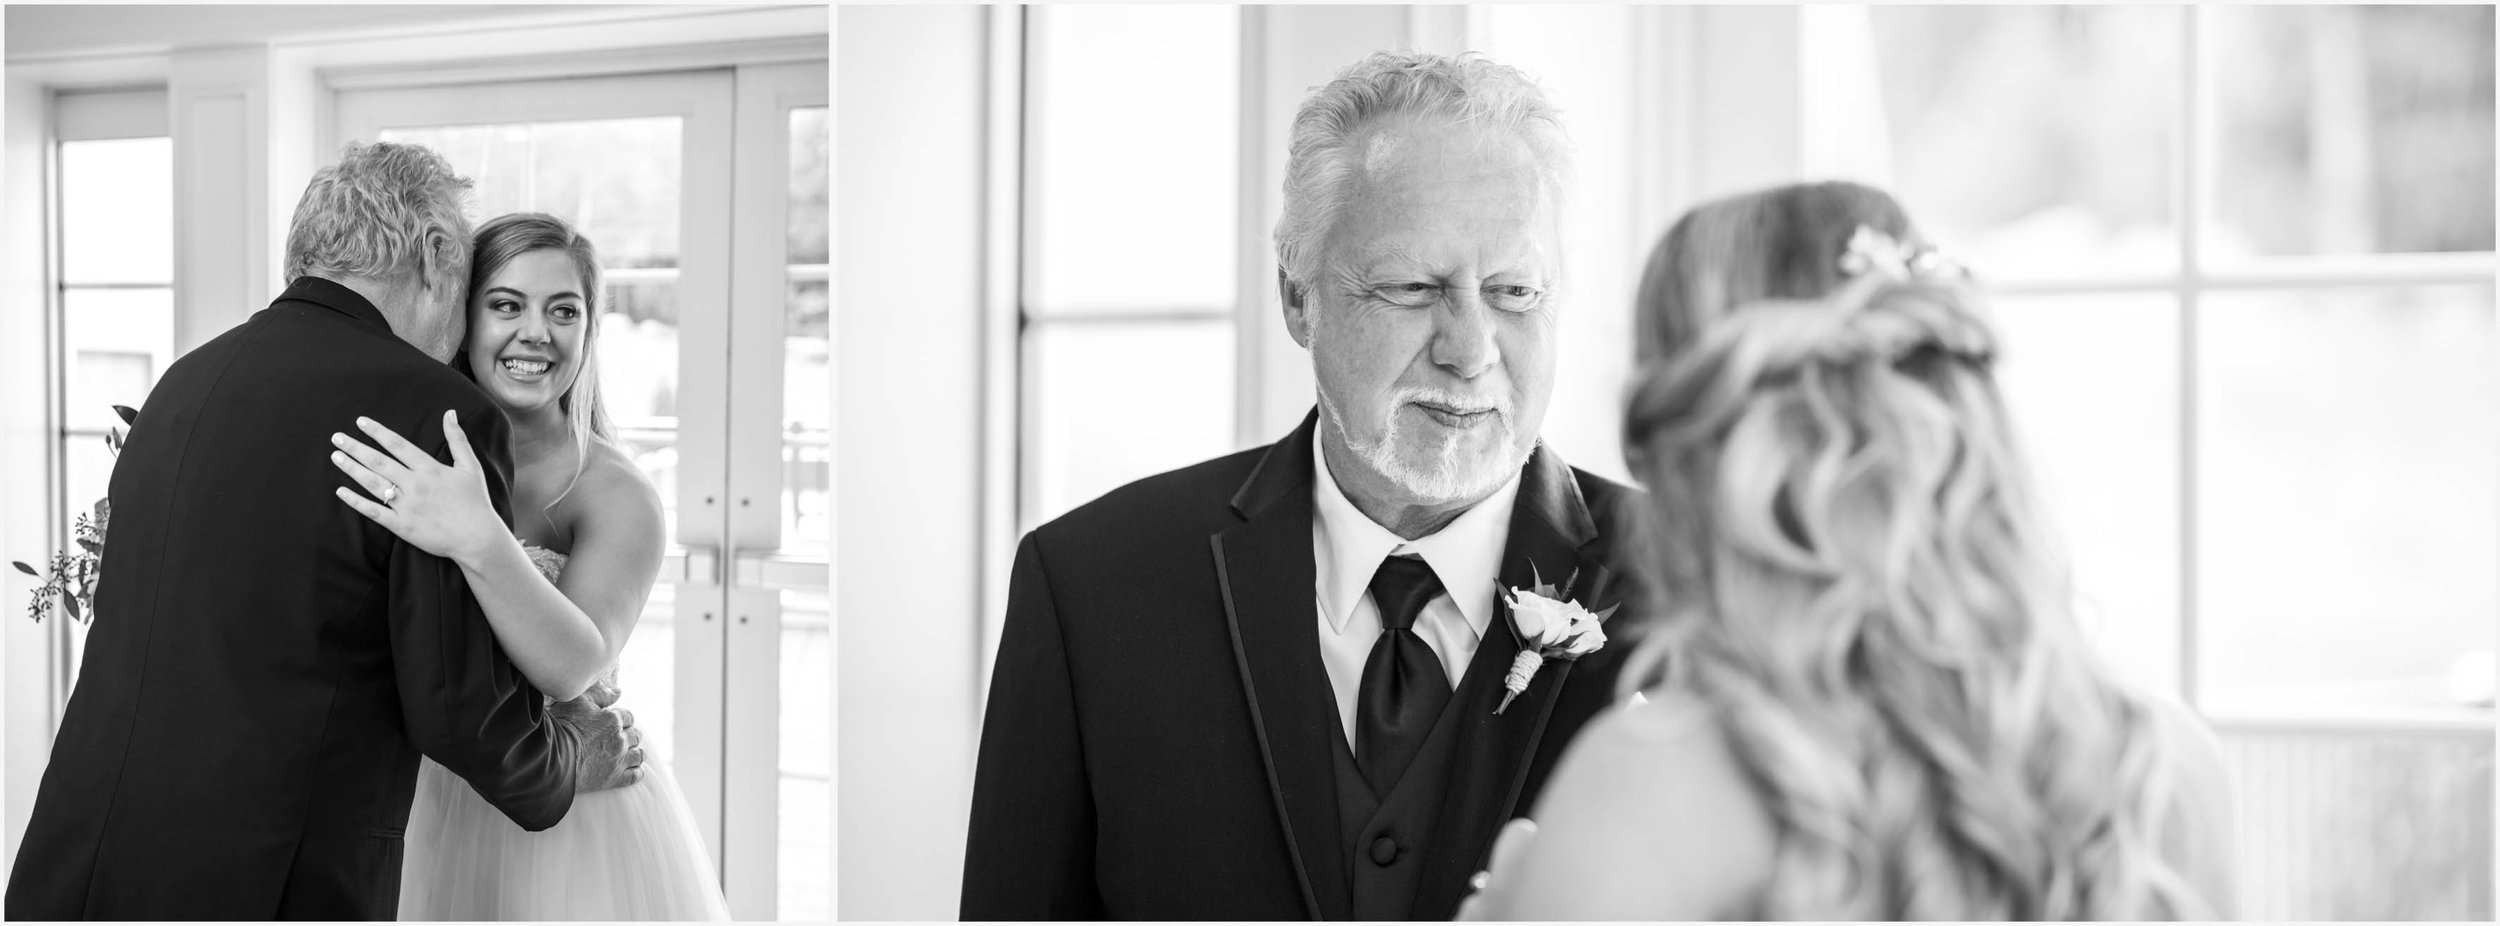 Cassondre Mae Photography Hudson Valley NY Wedding Photographer -9.jpg